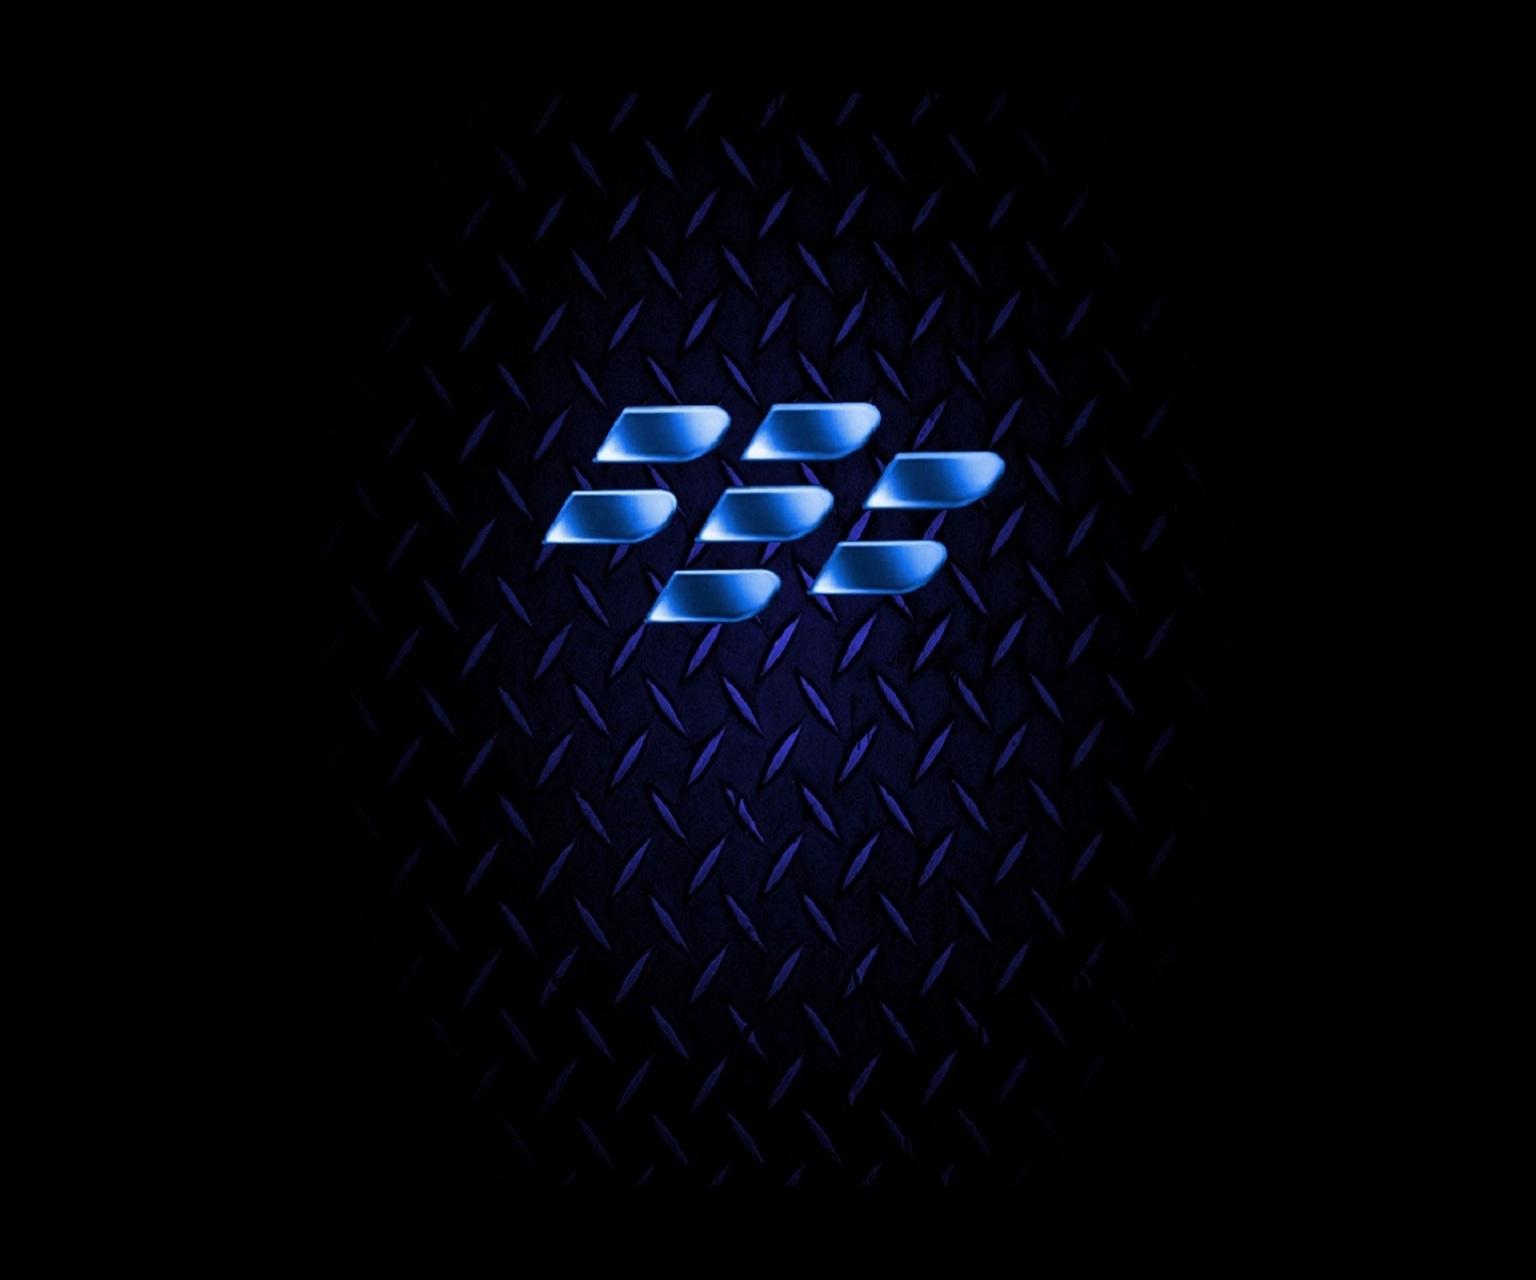 Blackberry Logo Wallpaper 04 1536x1280